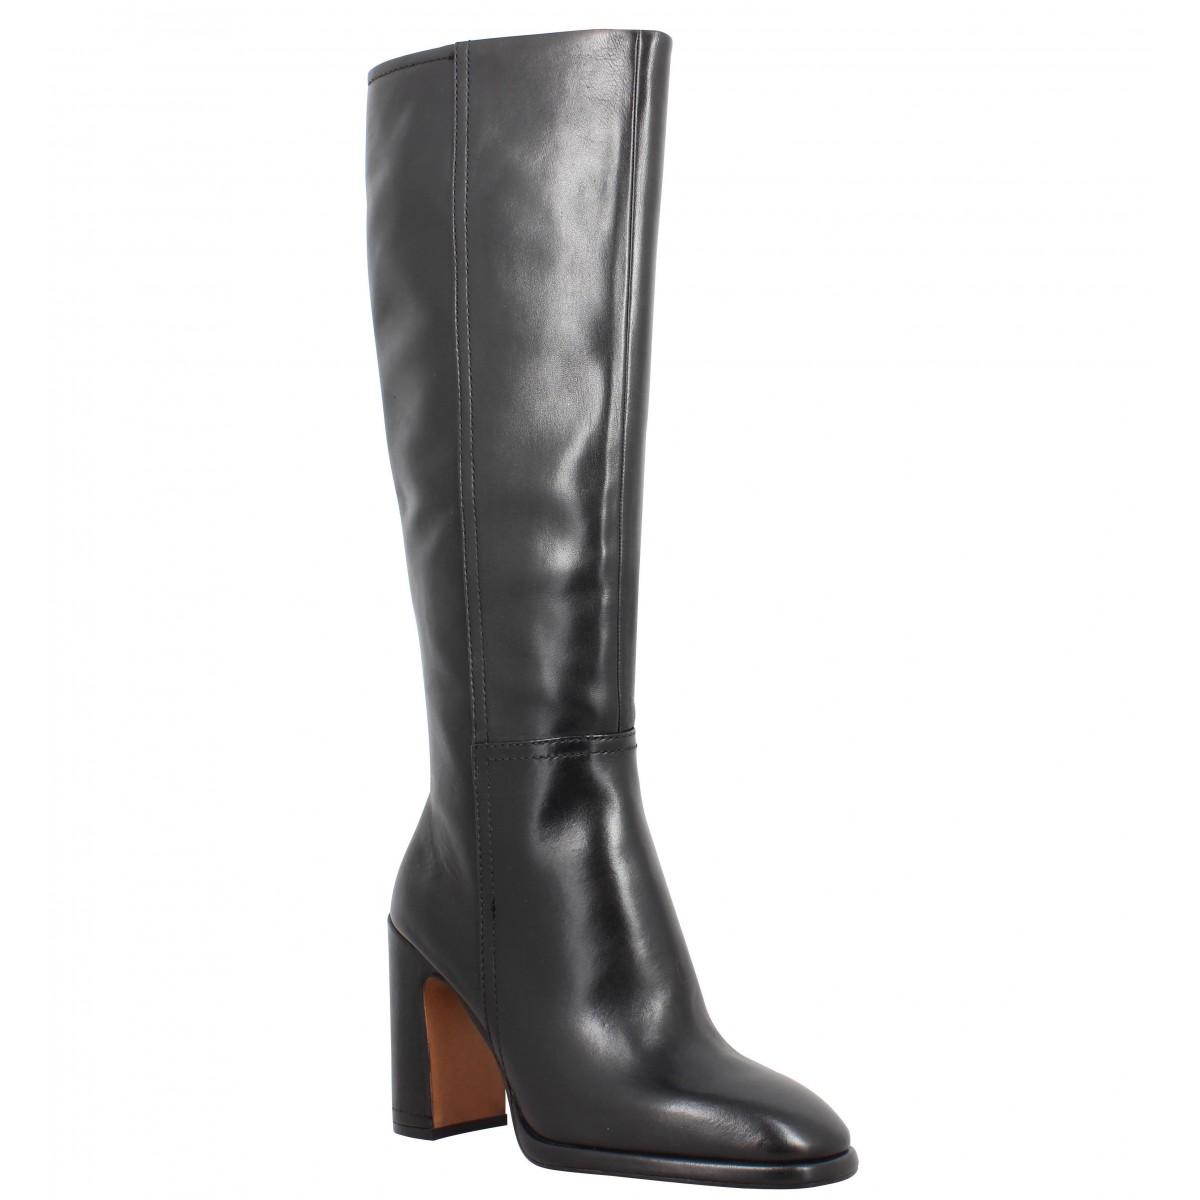 Bottes BRUNO PREMI 3305 cuir Femme Noir